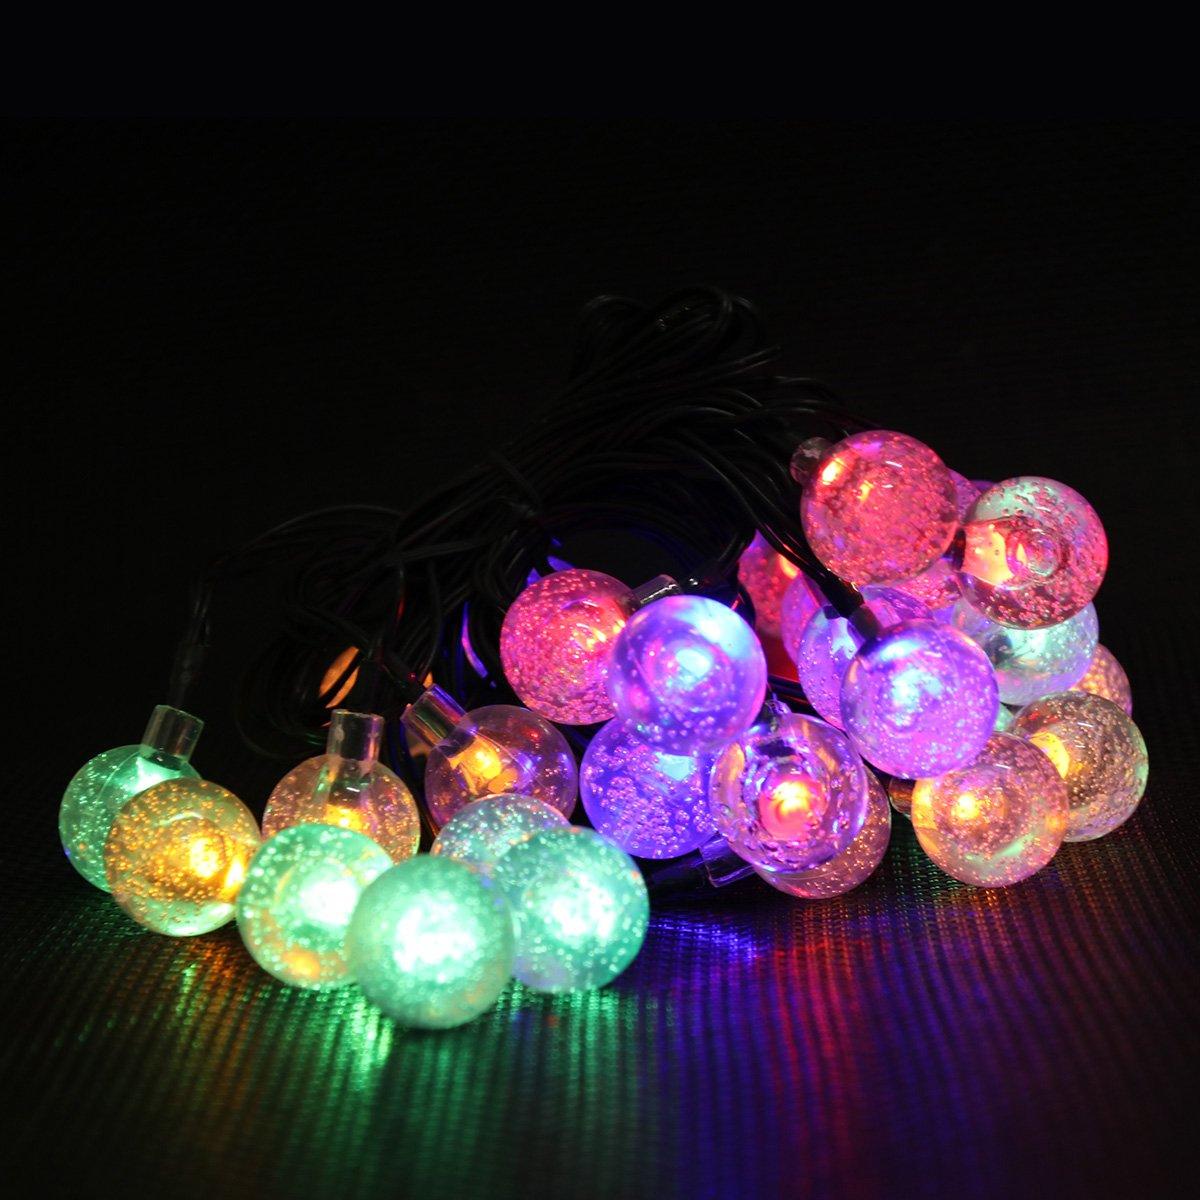 Multi-Color Ambiance Lighting for Bedroom//Patio//Garden//Parties//Wedding//Festival JML WFD Waterproof 19.7ft 30 LED Water//Rain Drop Fairy Lights Solar Outdoor String Light